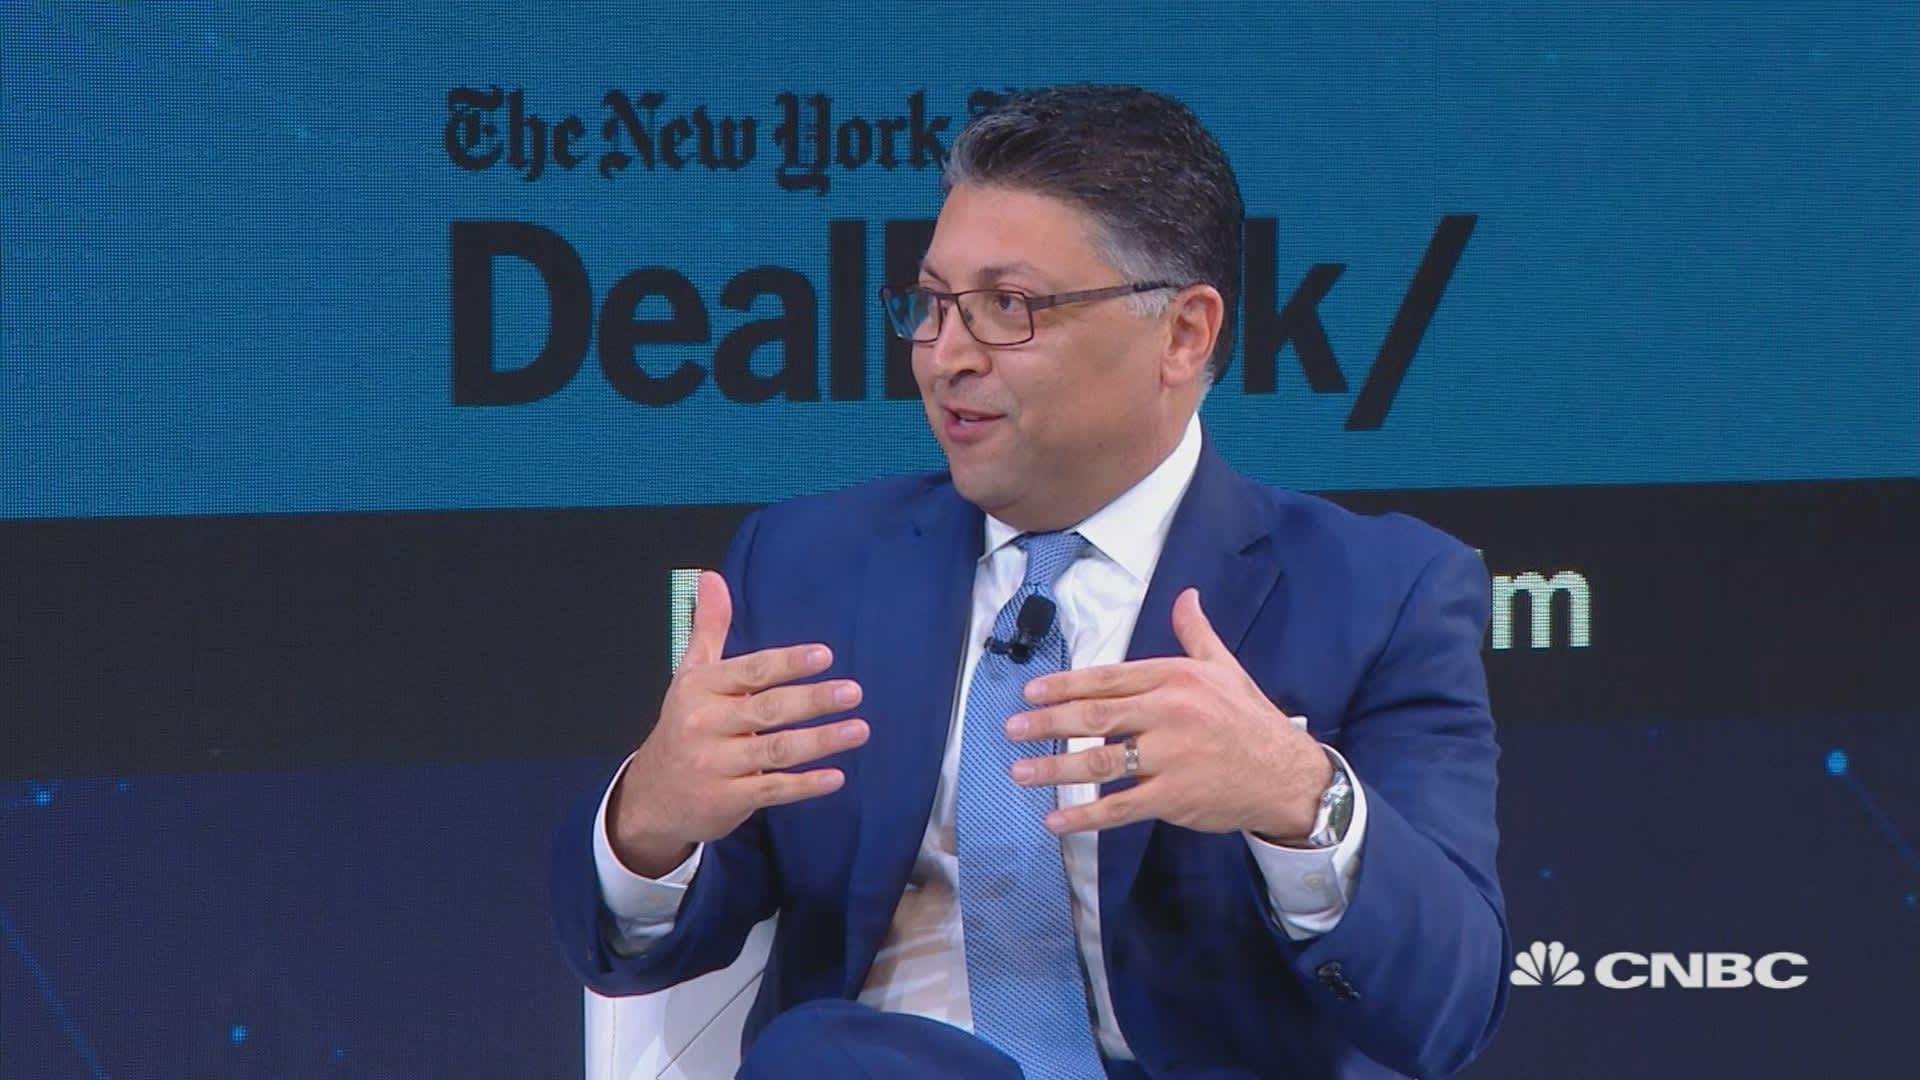 The DOJ's antitrust chief confirmed that he talks to Trump